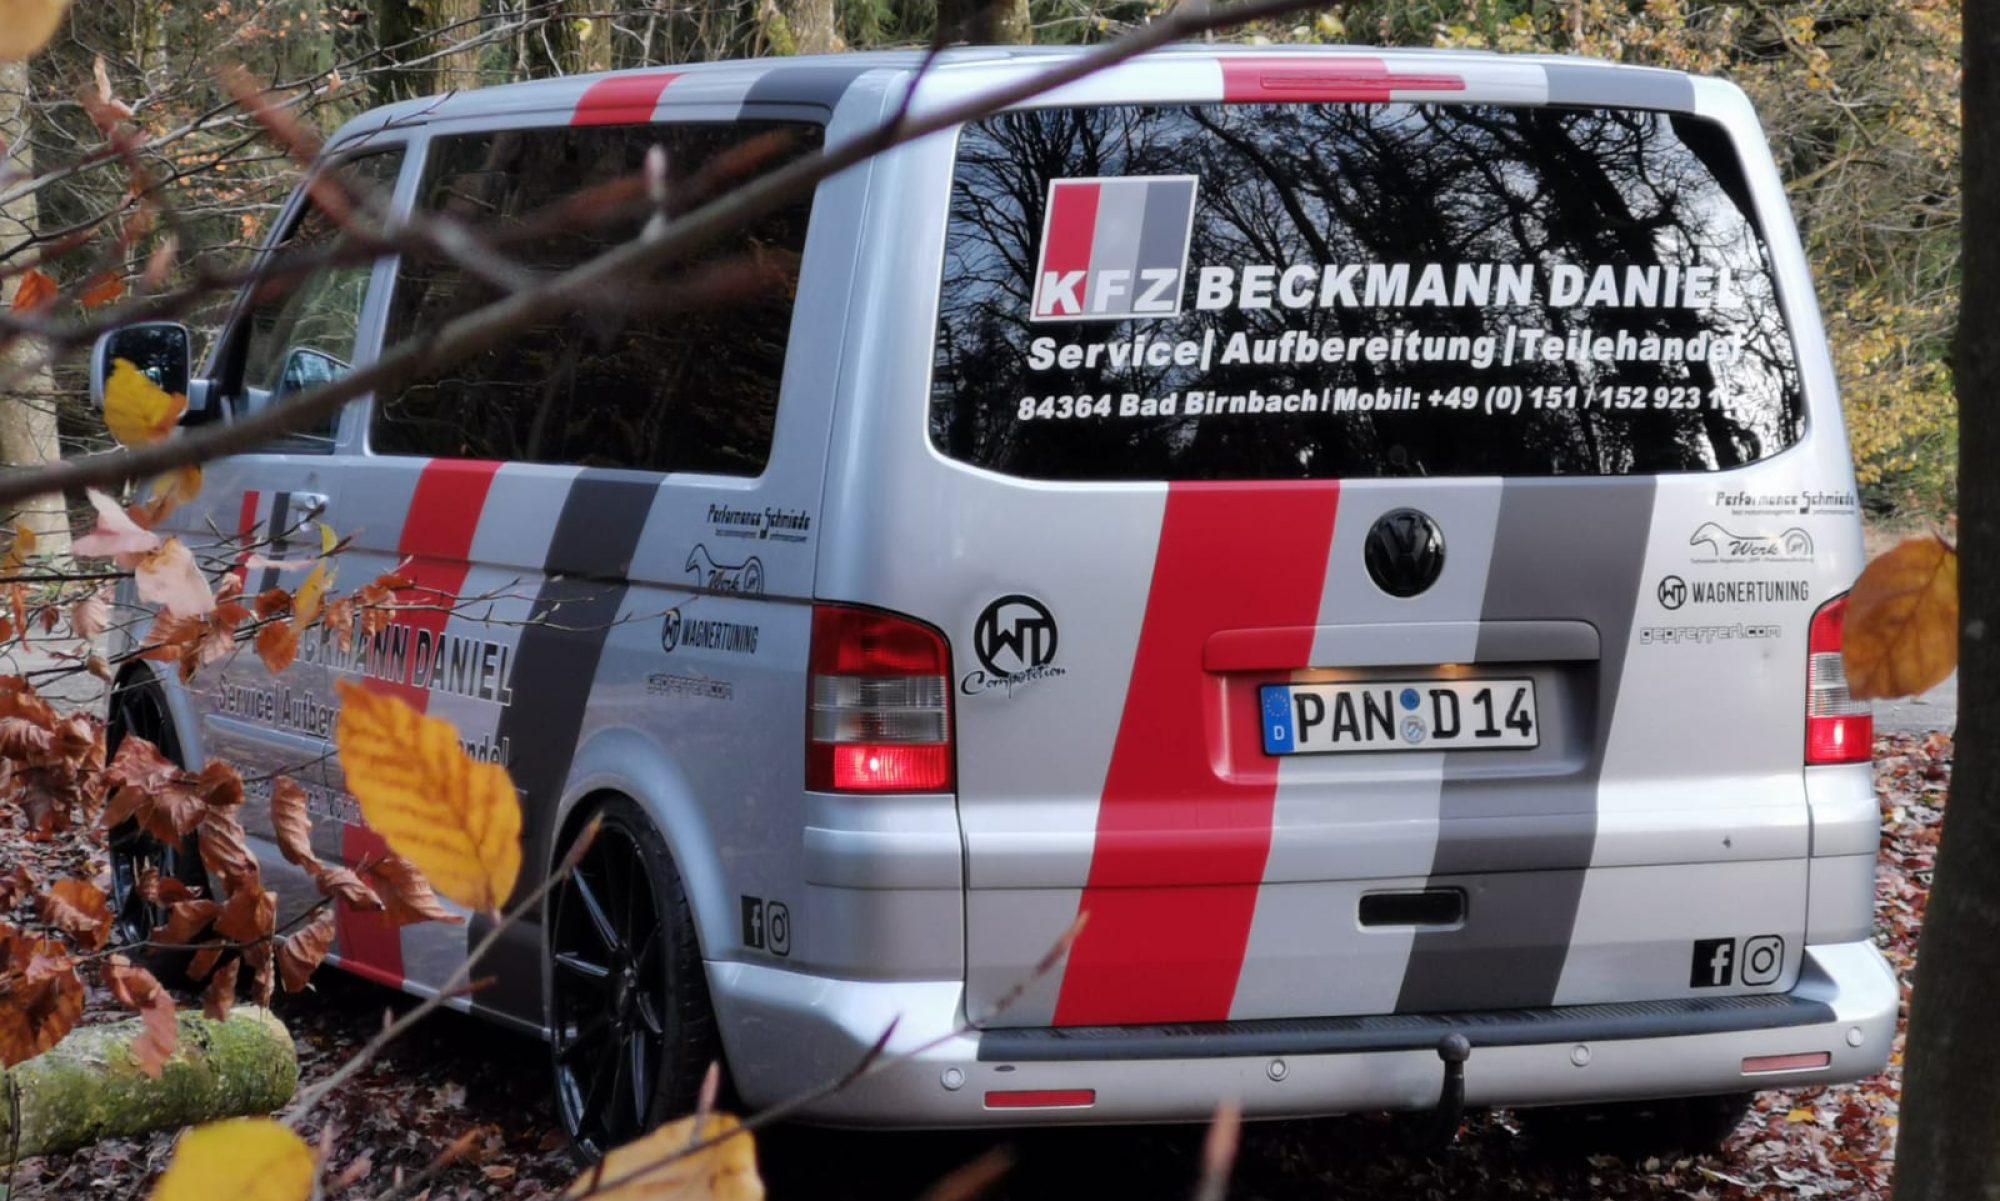 KFZ Service Daniel Beckmann